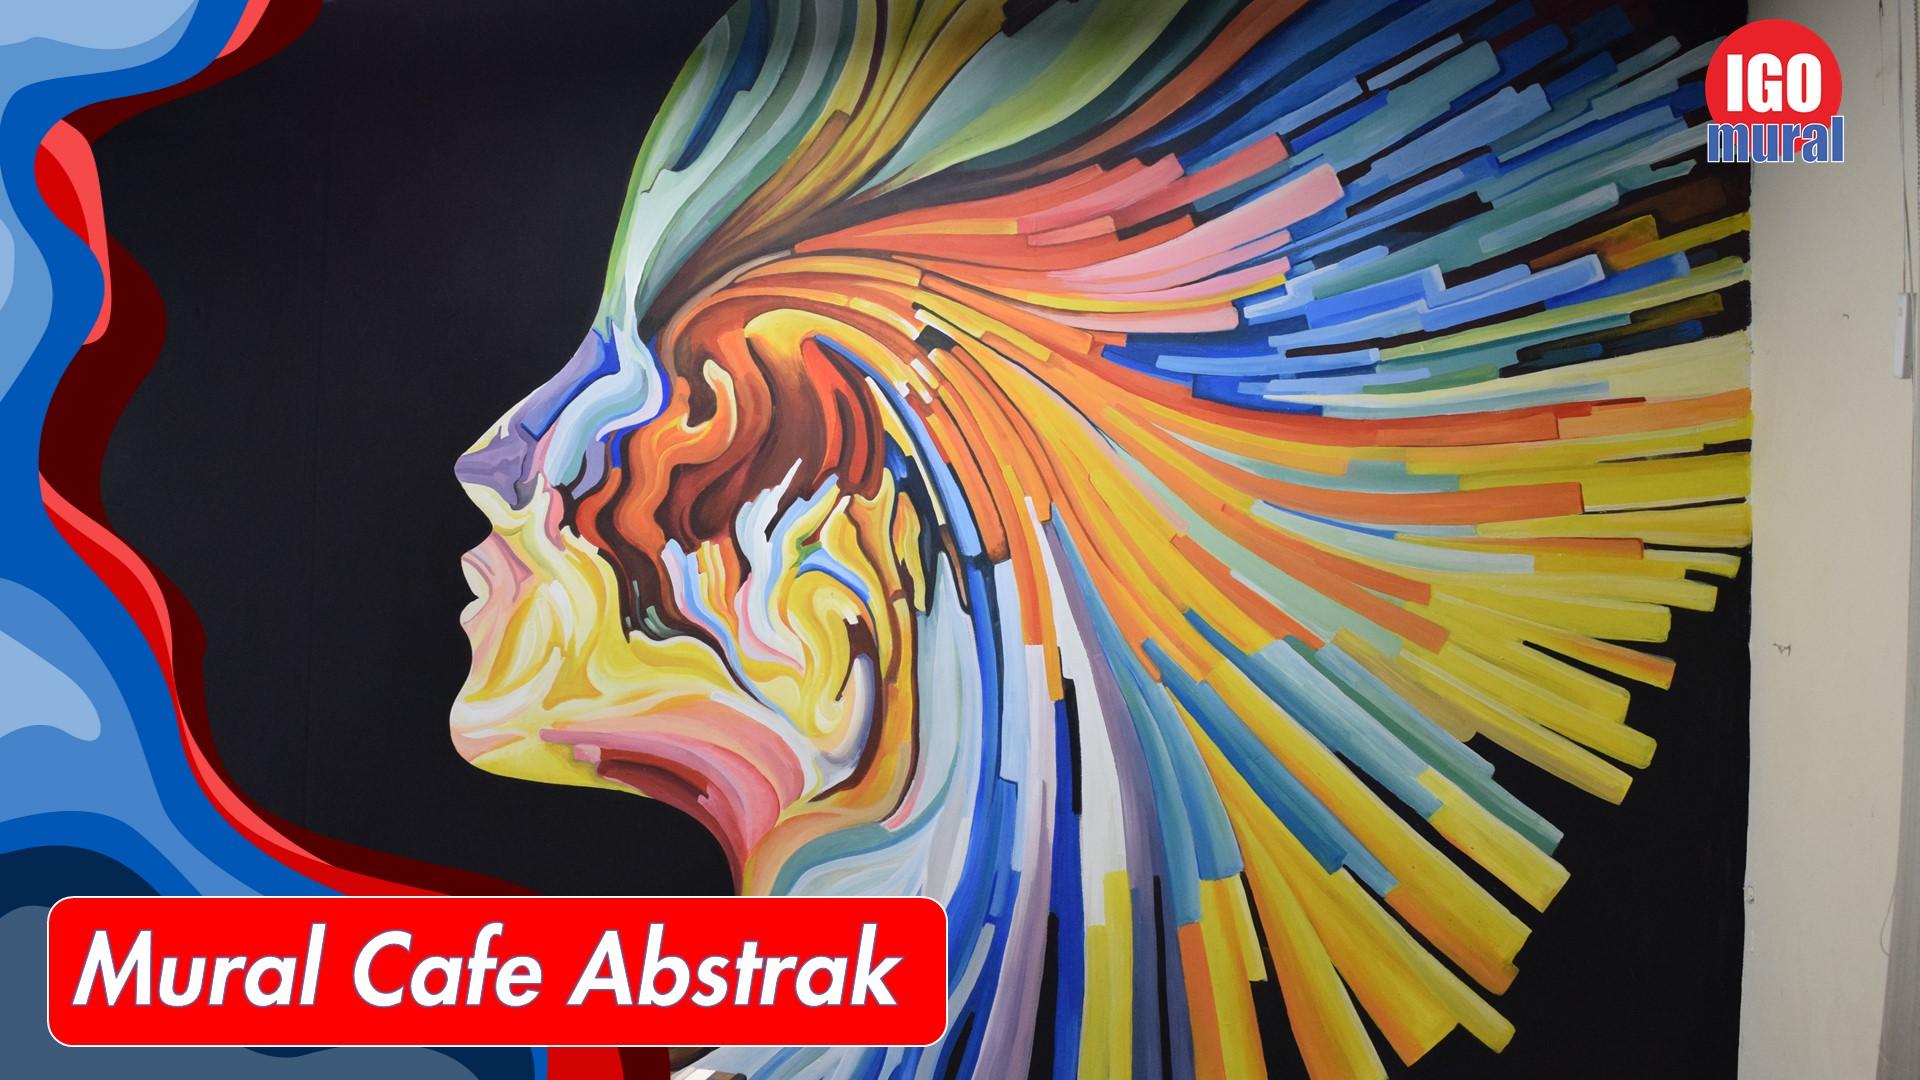 Mural Cafe Abstrak